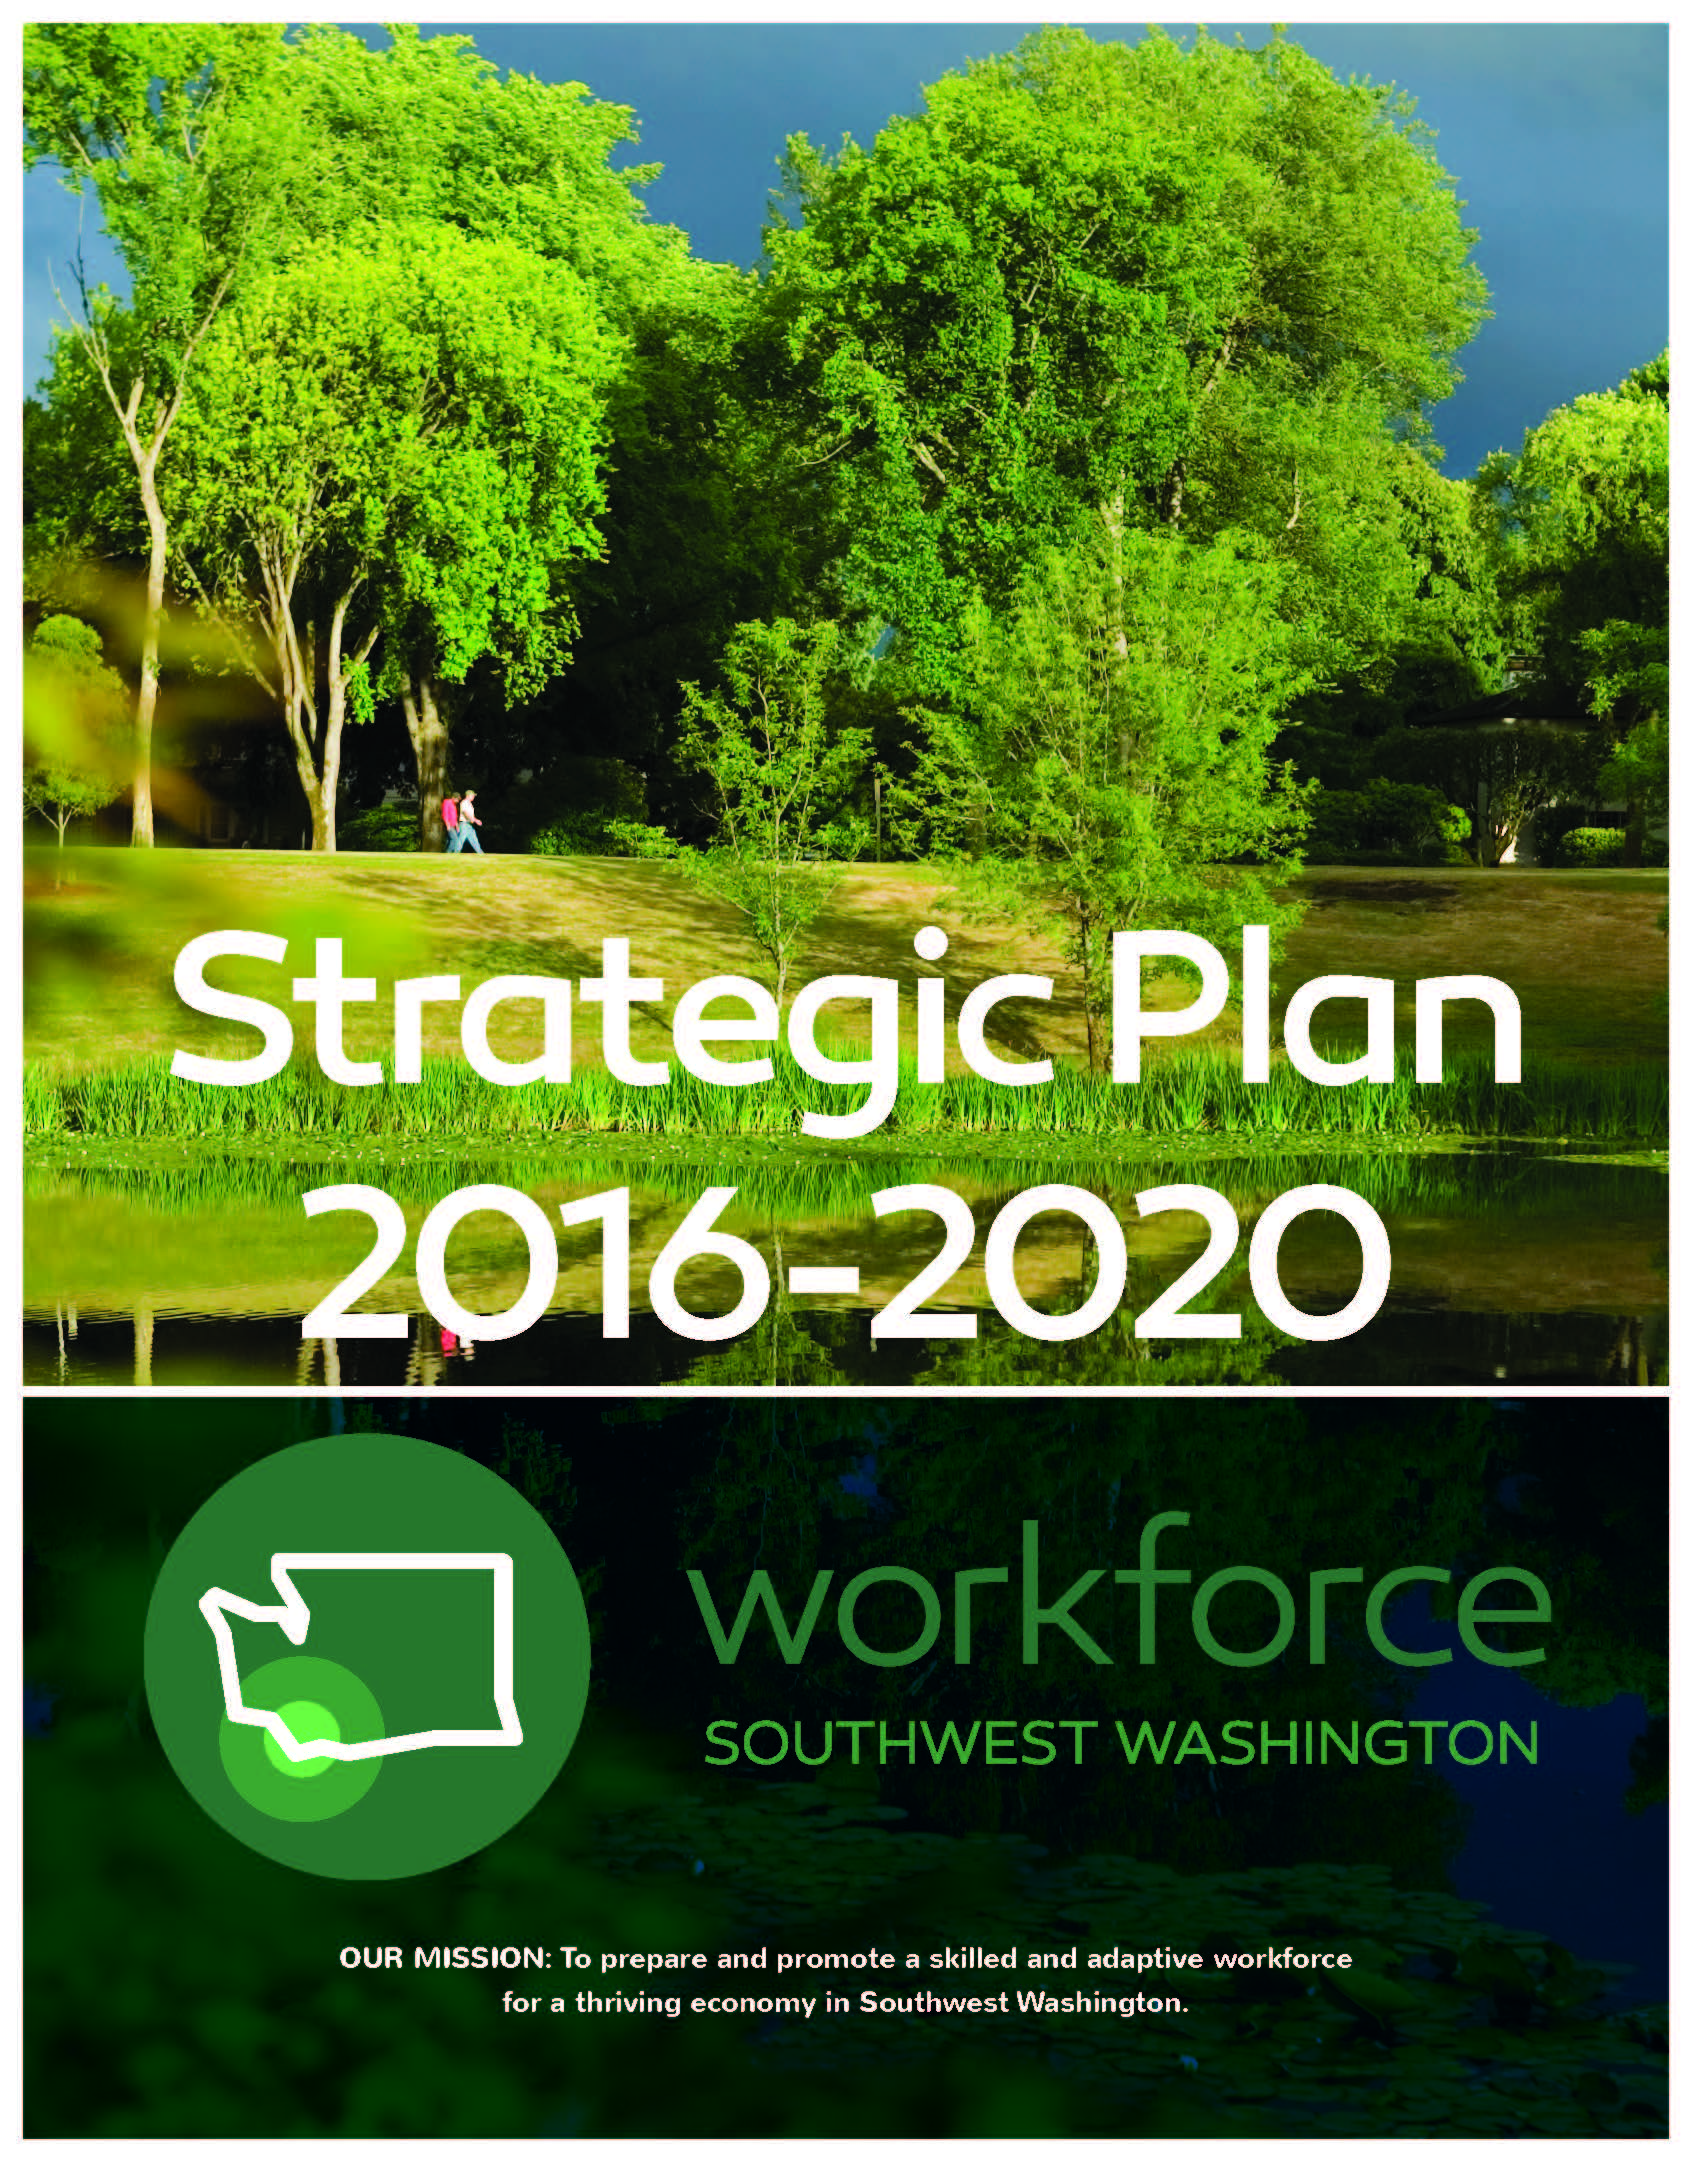 wsw-strategicplan2016-2020-cover